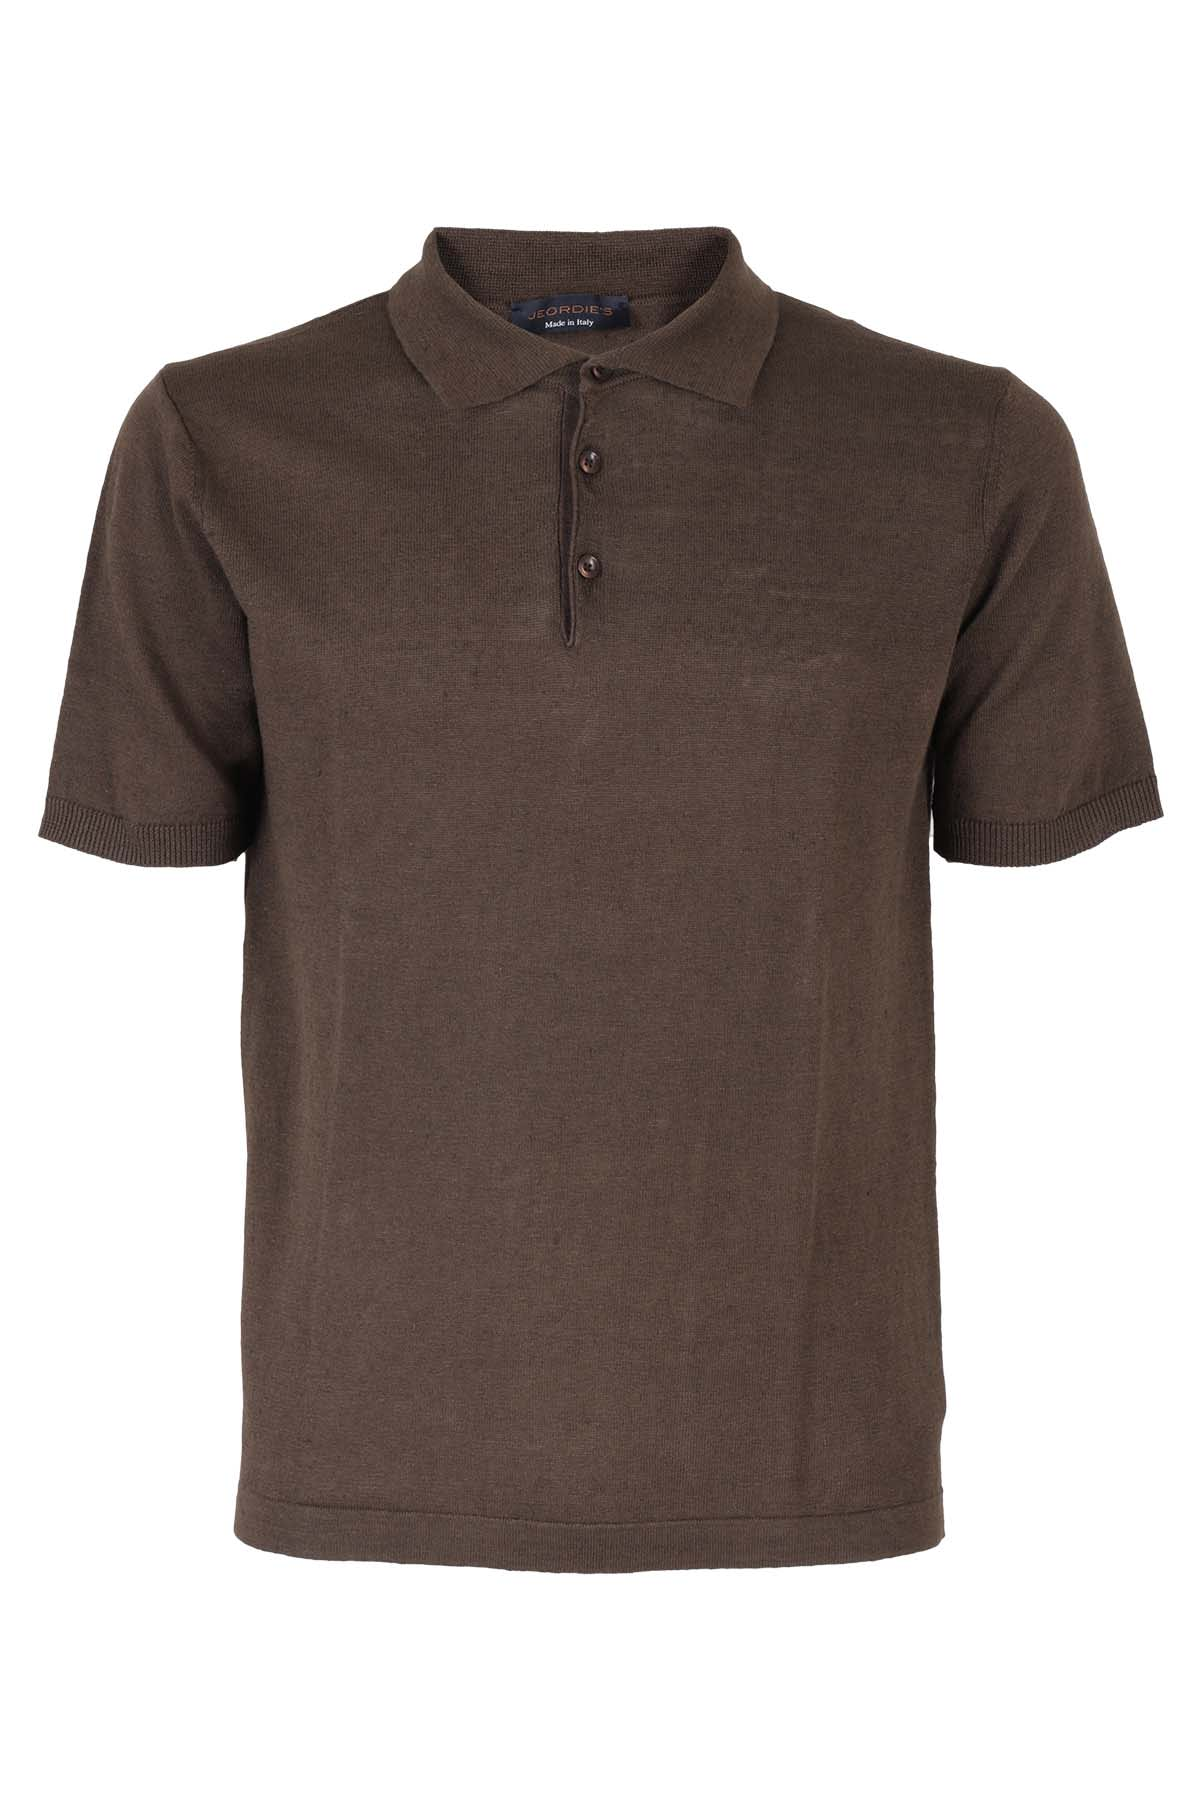 Jeordies Polo Shirt